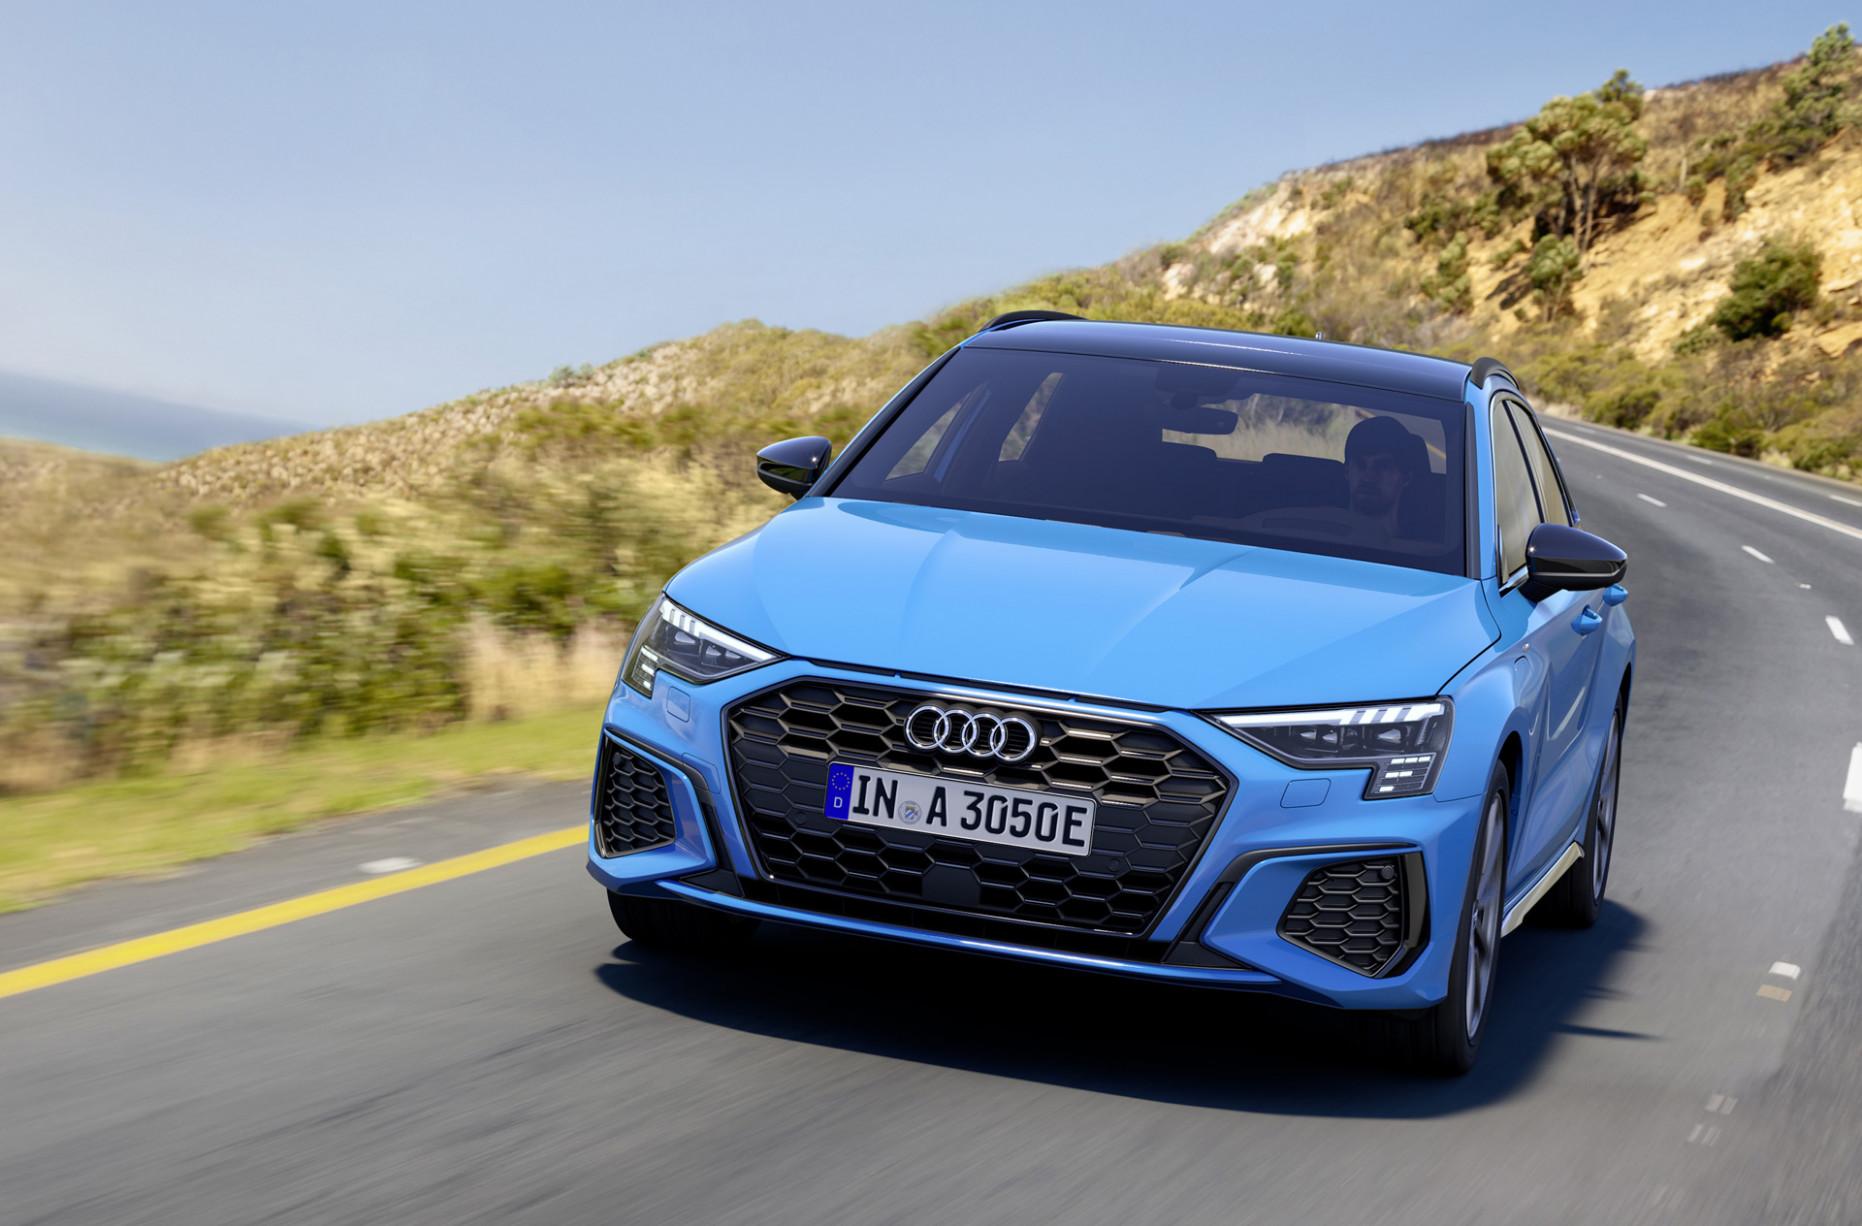 Exterior Audi Plug In Hybrid 2022